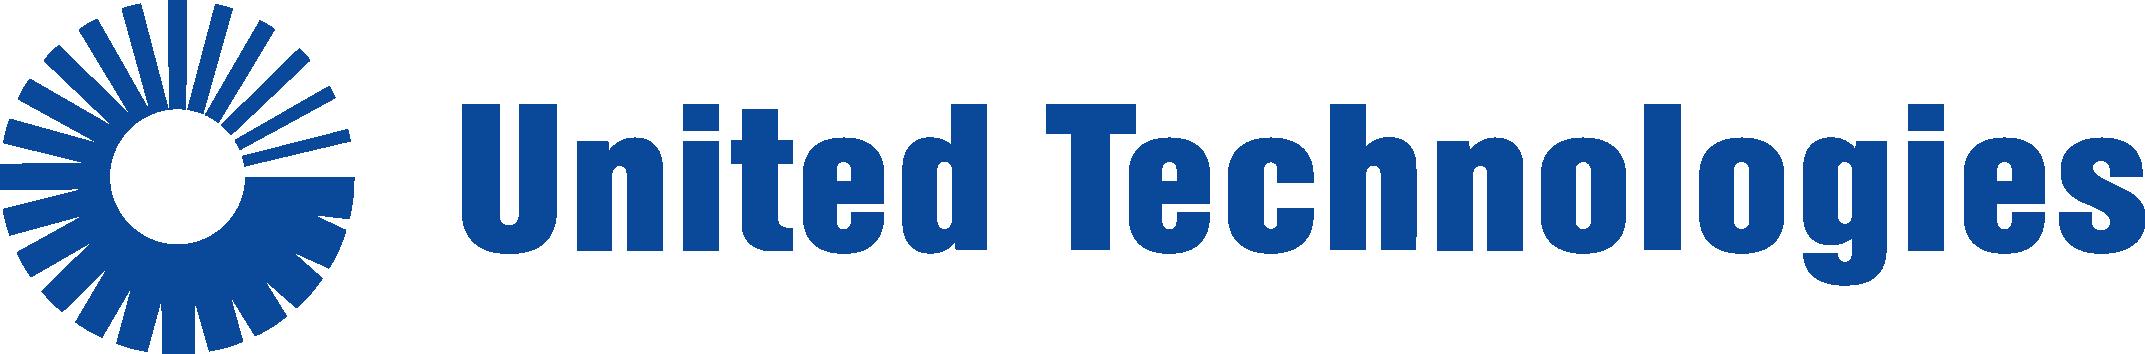 UTC Technologies